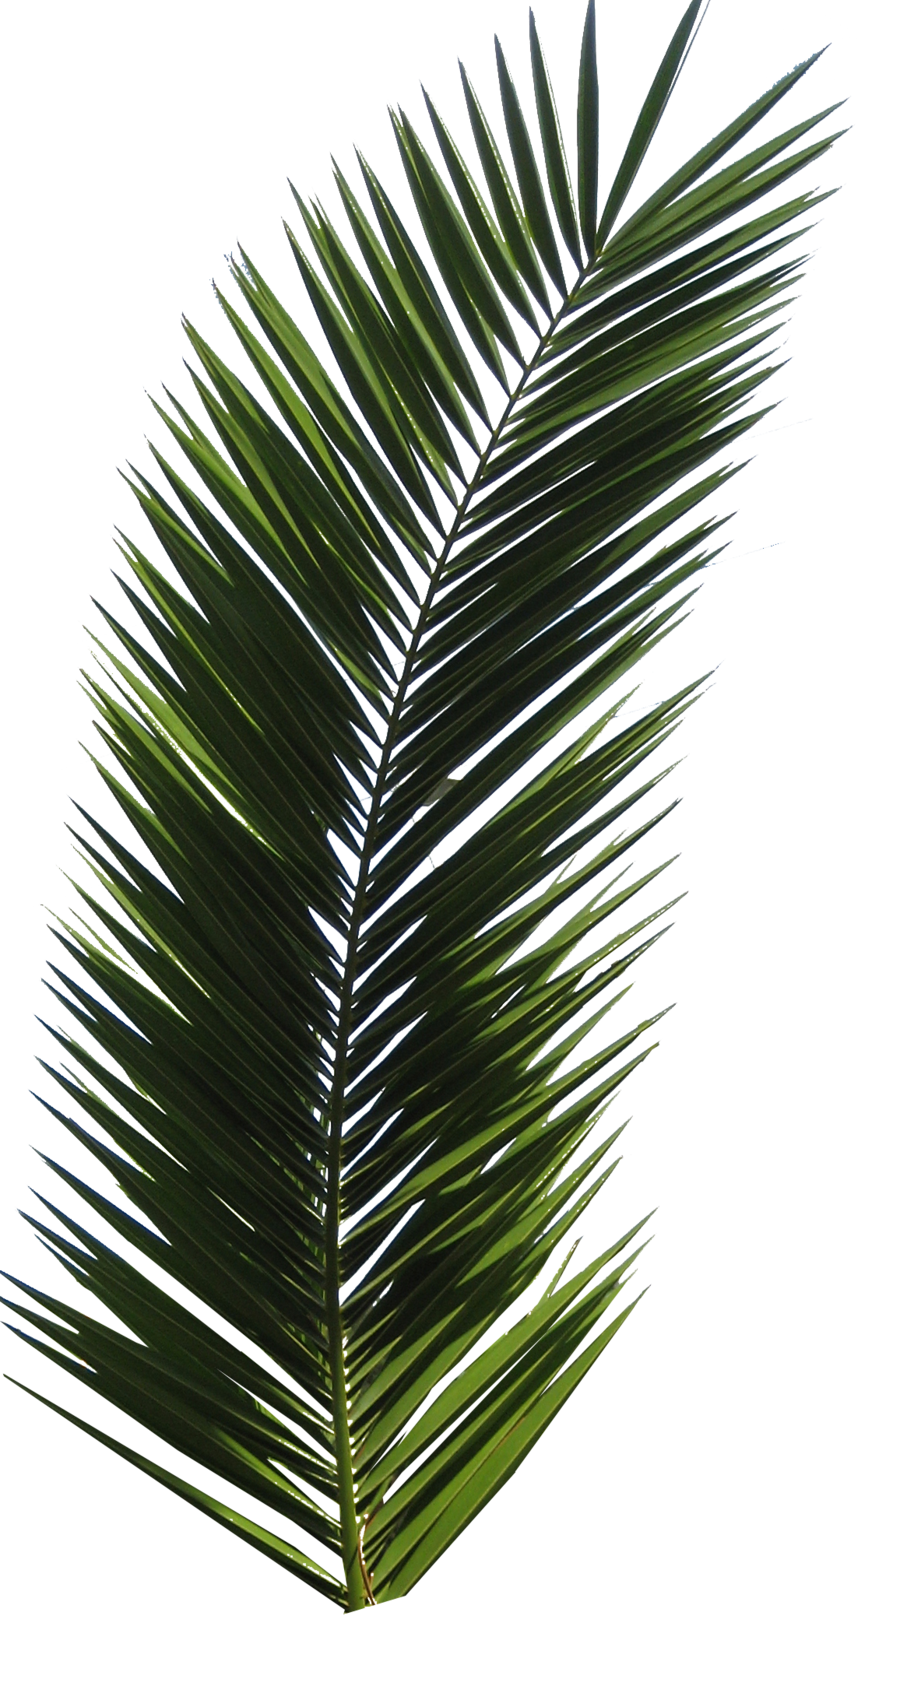 Palm Tree Tube Stock Vi Png By Digitaltwist On Deviantart Palm Tree Png Palm Tree Leaves Palm Tree Tattoo